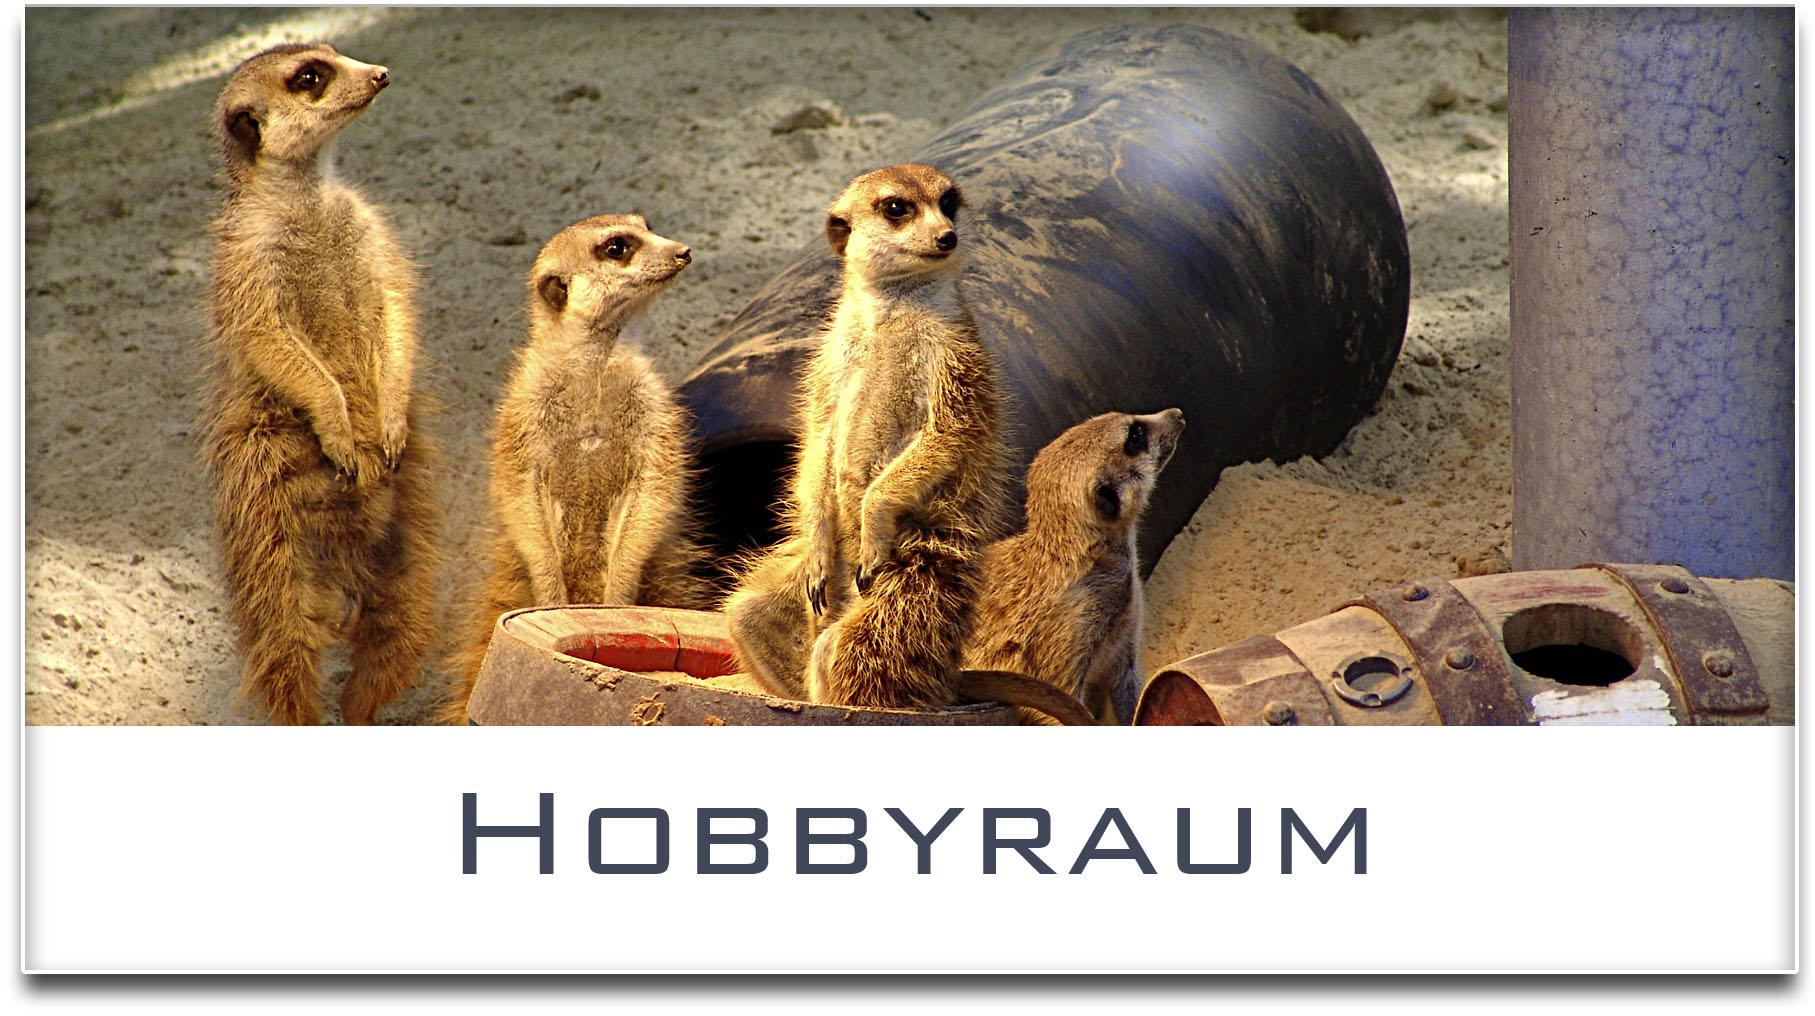 Türschild / Haustürschild / Erdmännchen / Hobbyraum / Selbstklebend